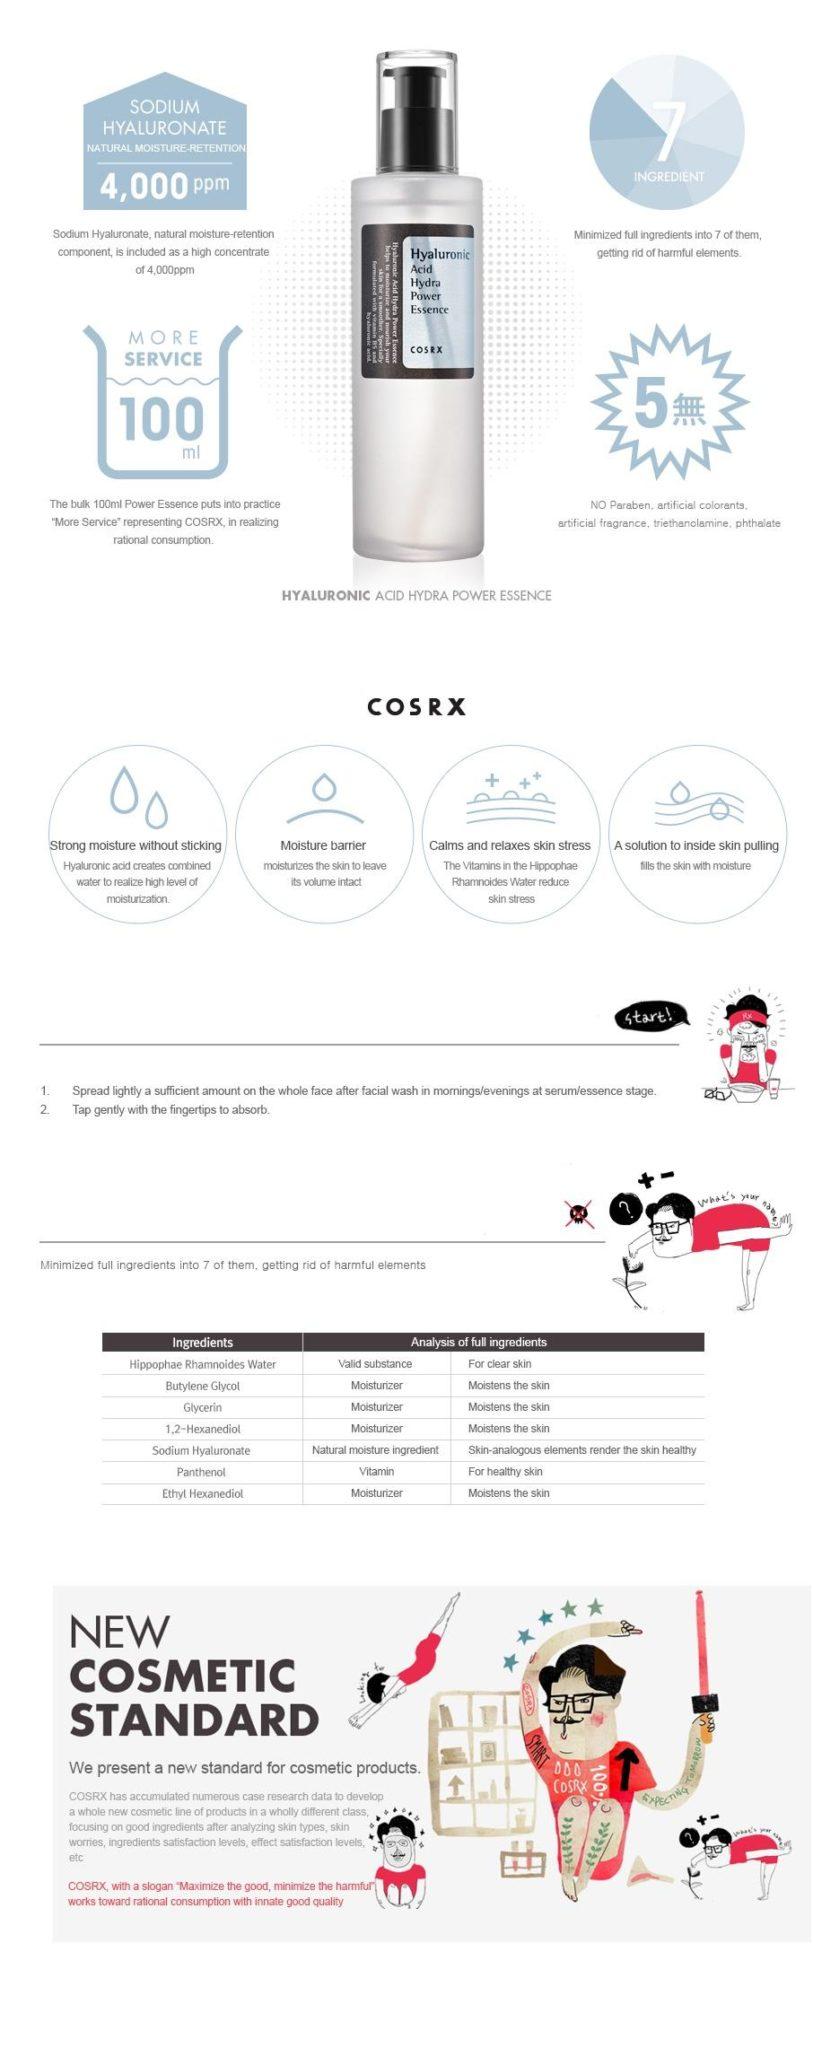 COSRX Hyaluronic Acid Hydra Power Essence 100ml